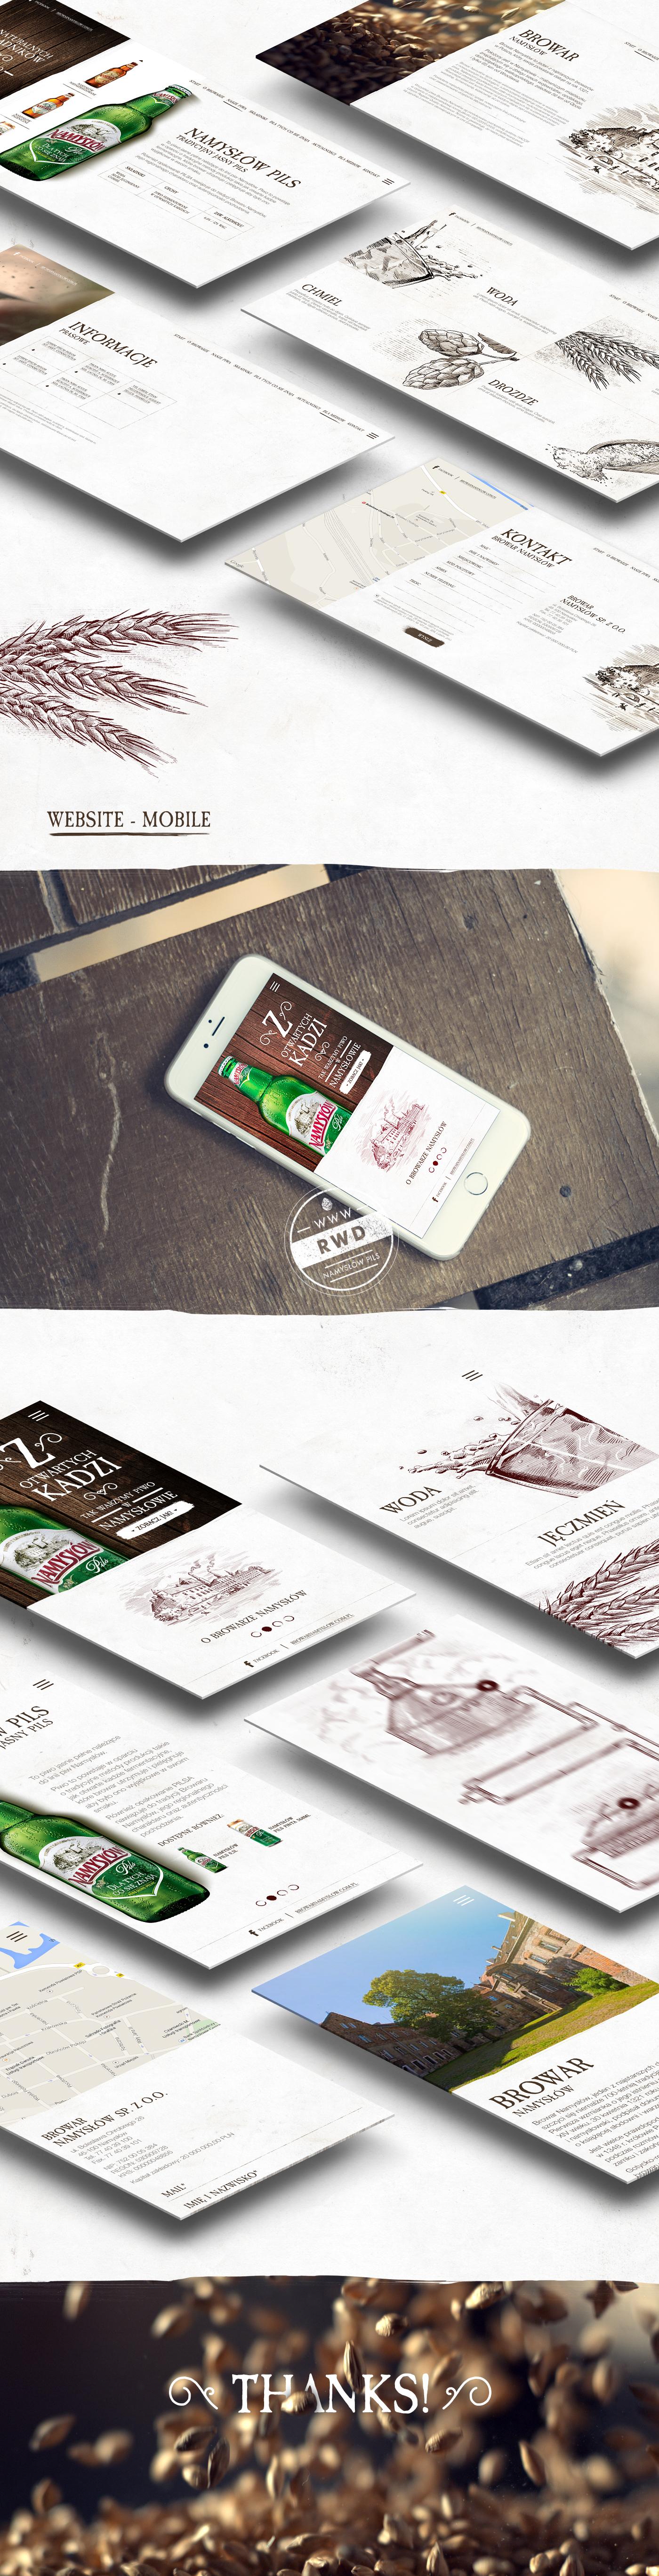 rudzki Adam design designer art director BBDO warsaw tvc namyslow namysłów pils ad campaign beer